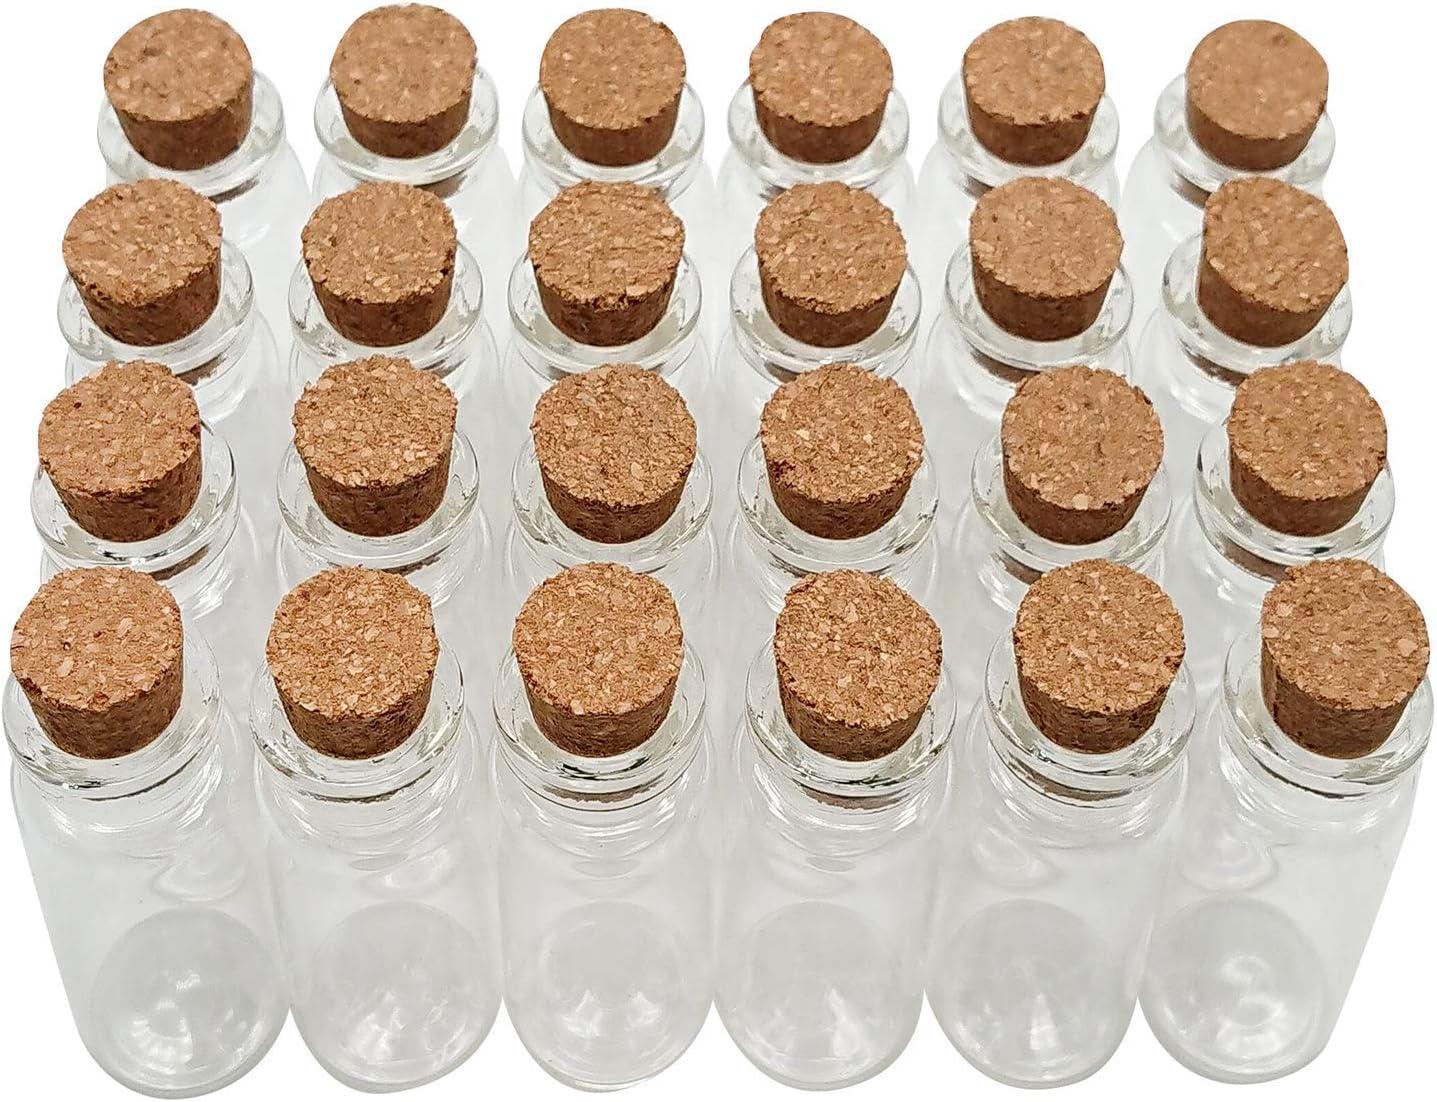 Axe Sickle 10 mL Cork Stopper Glass Bottles Mini Clear Glass Bottles 48 Pcs.